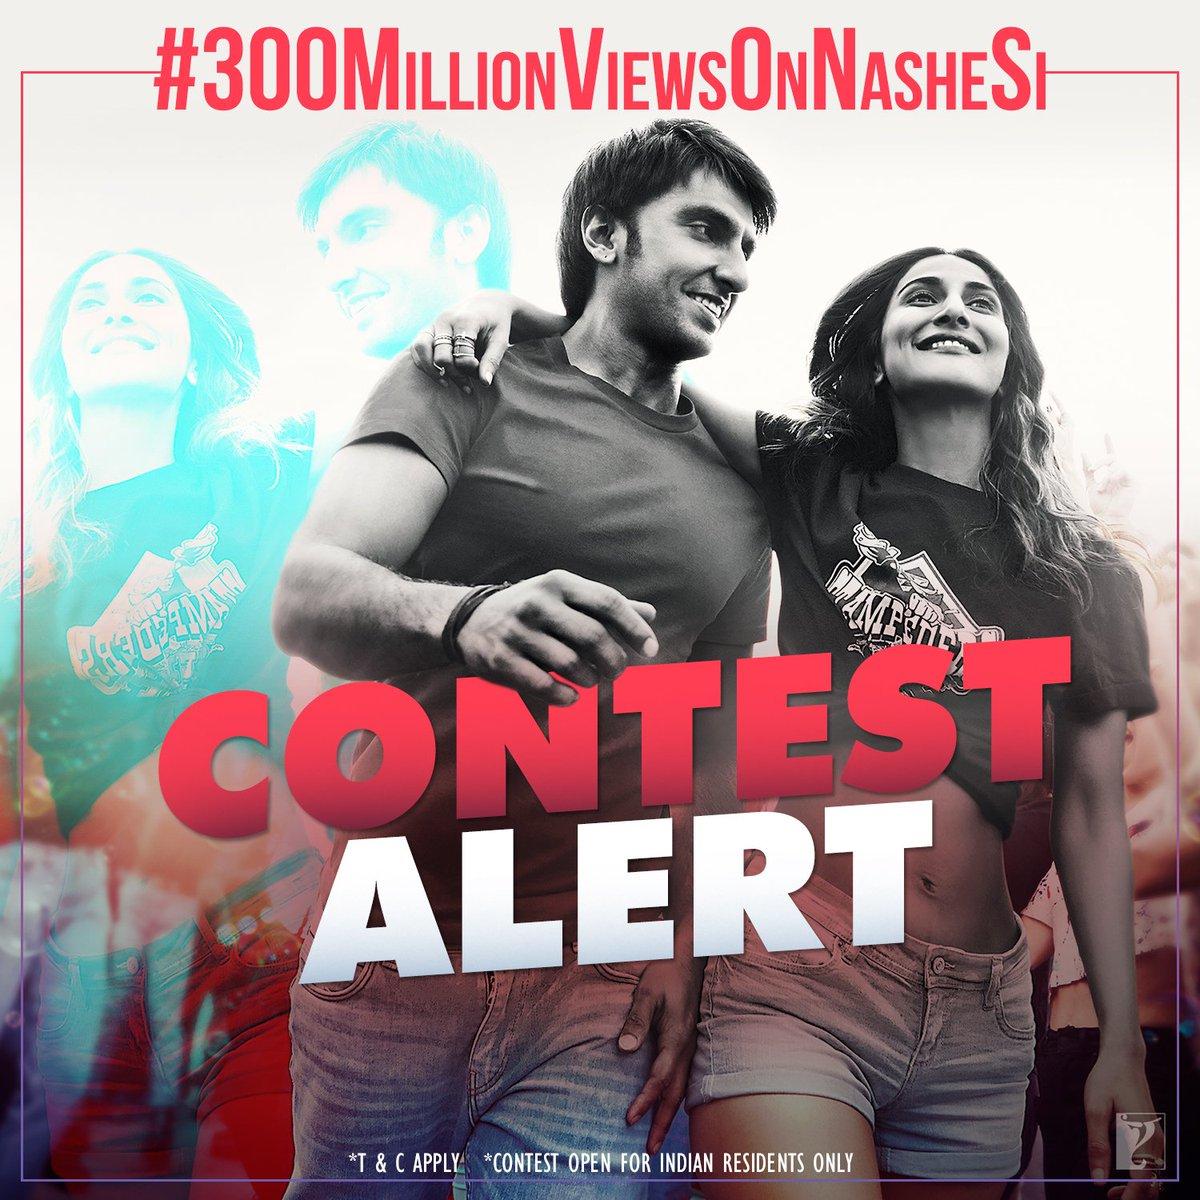 #ContestAlert - Stay tuned for the #300MillionViewsOnNasheSi contest!...